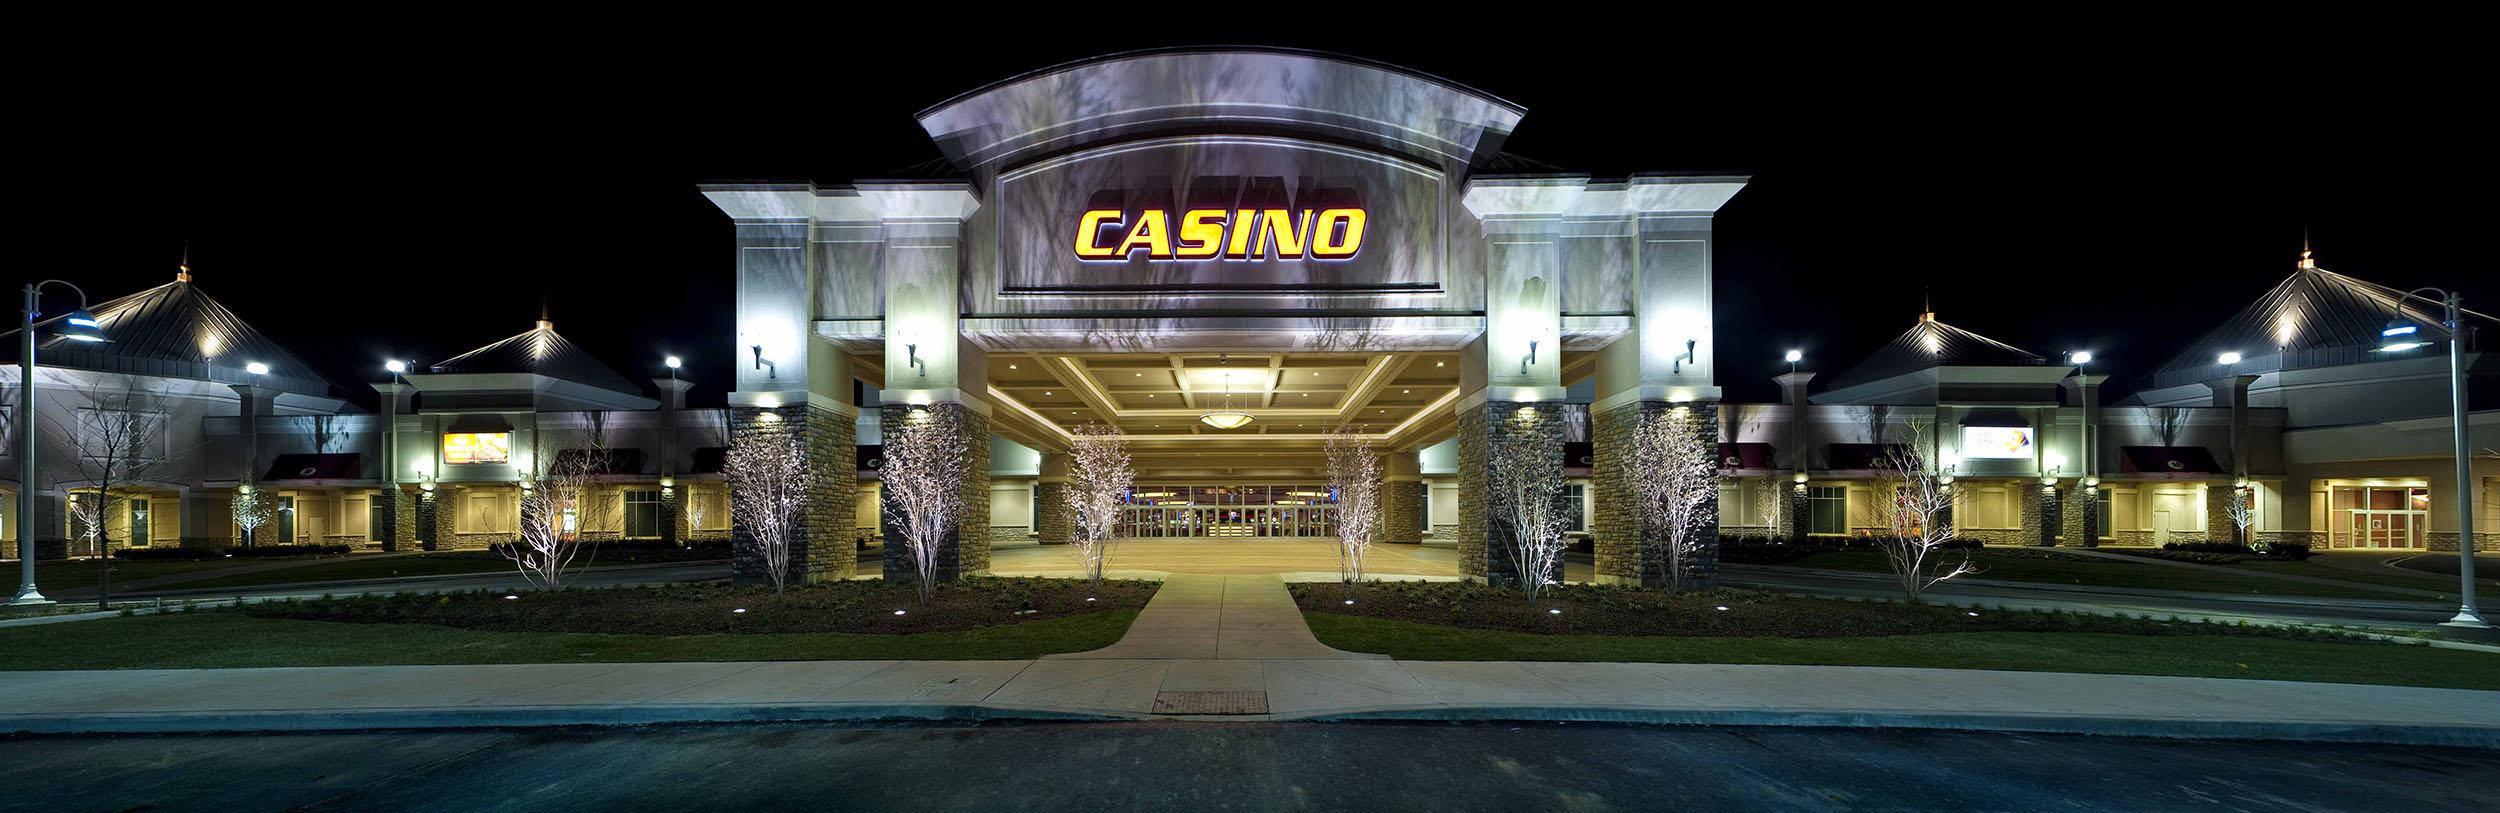 casinoA.jpg